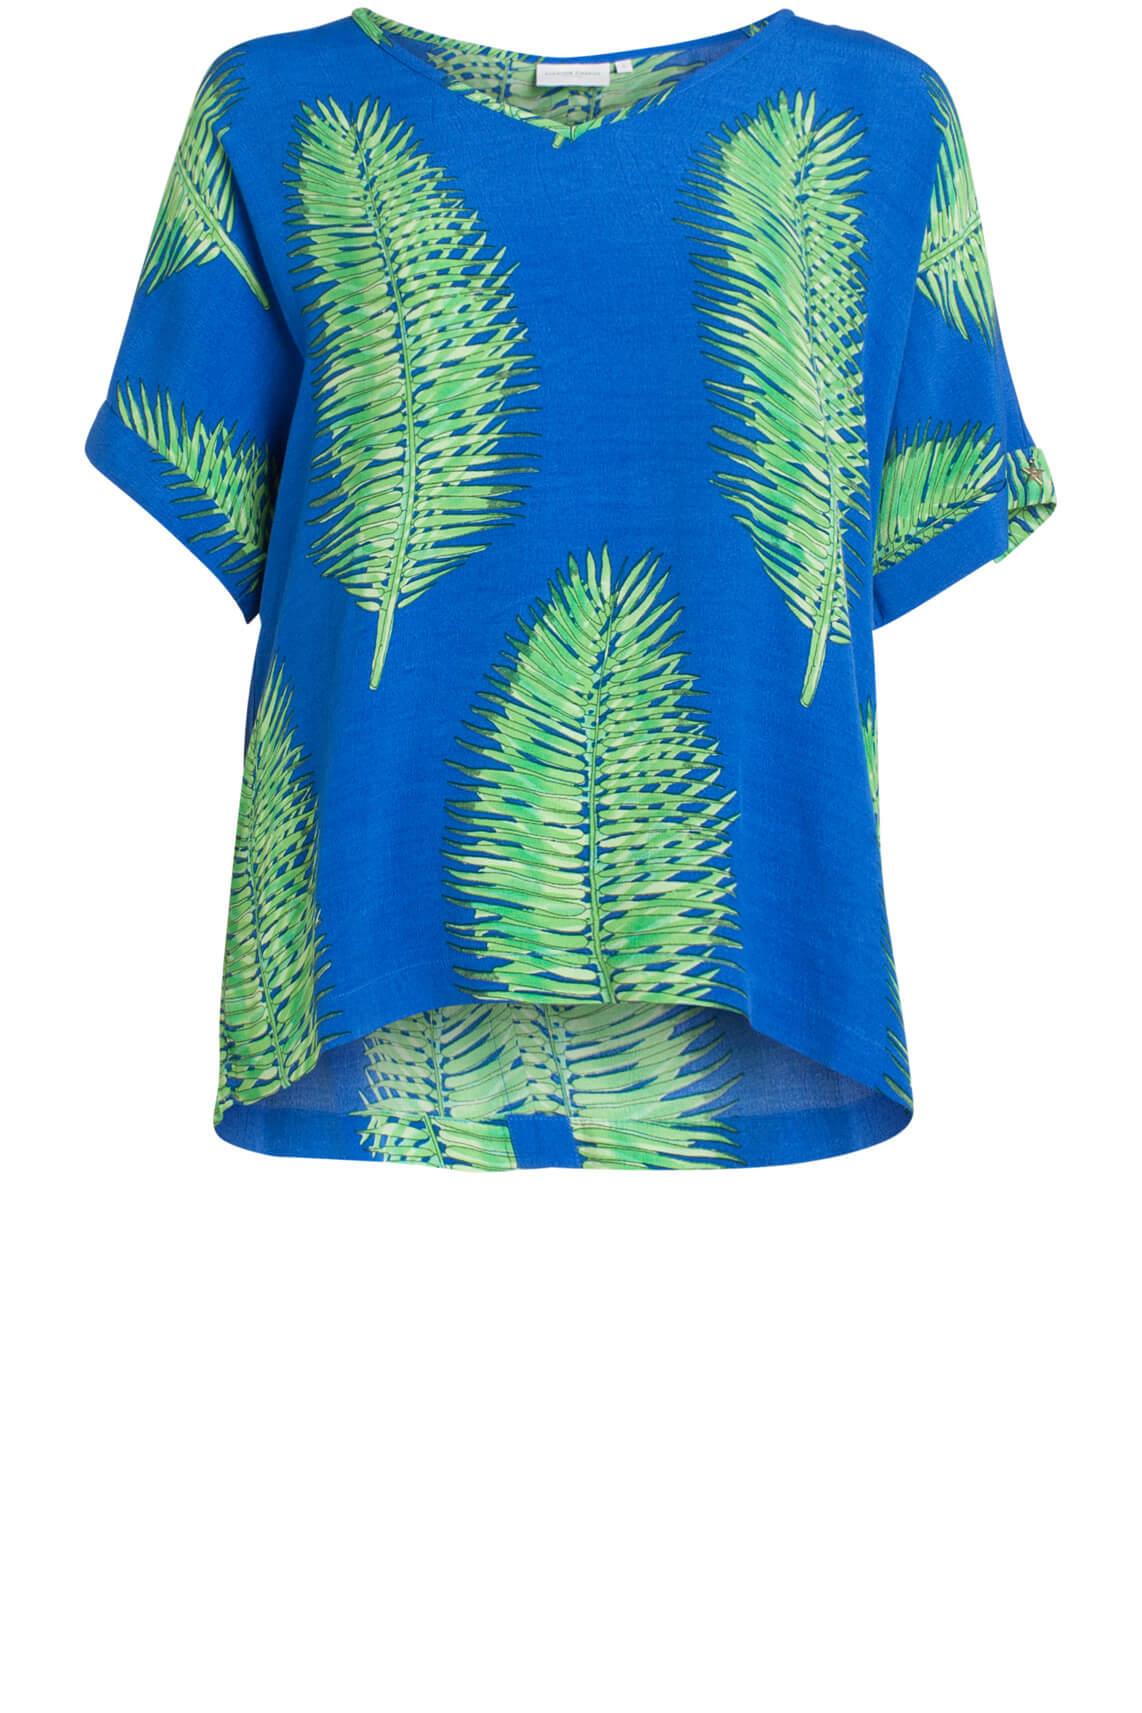 Fabienne Chapot Dames Shirt met palmblad Blauw